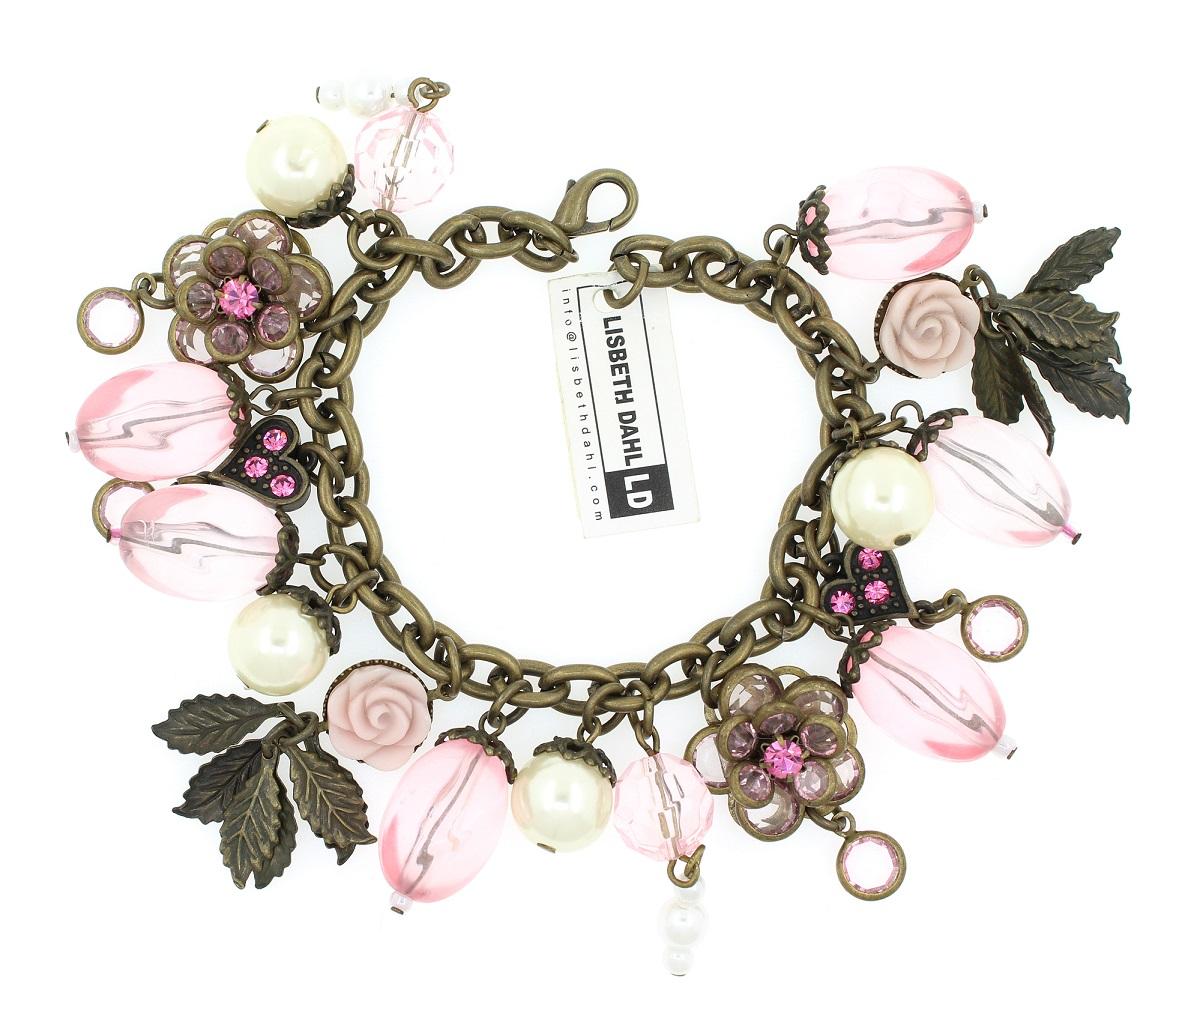 Lisbeth Dahl - Flower & Heart Charm Bracelet - Vintage Gold/Pinks